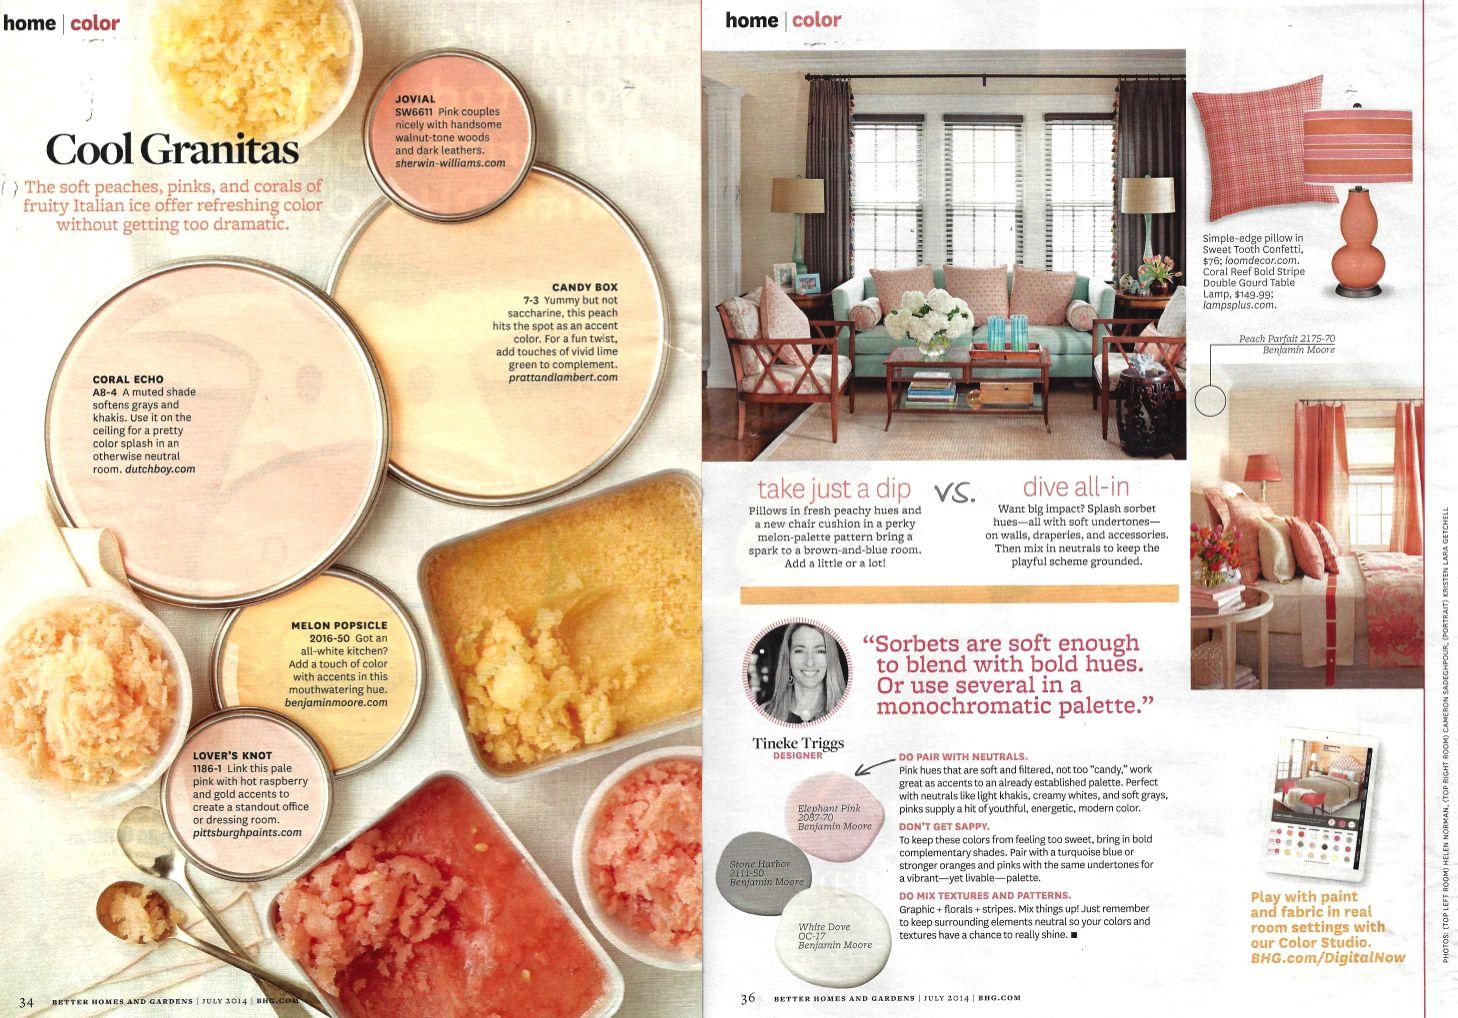 5c72a0e3fec01aa9533ccc91e7c25cc0 - Better Homes And Gardens Magazine July 2014